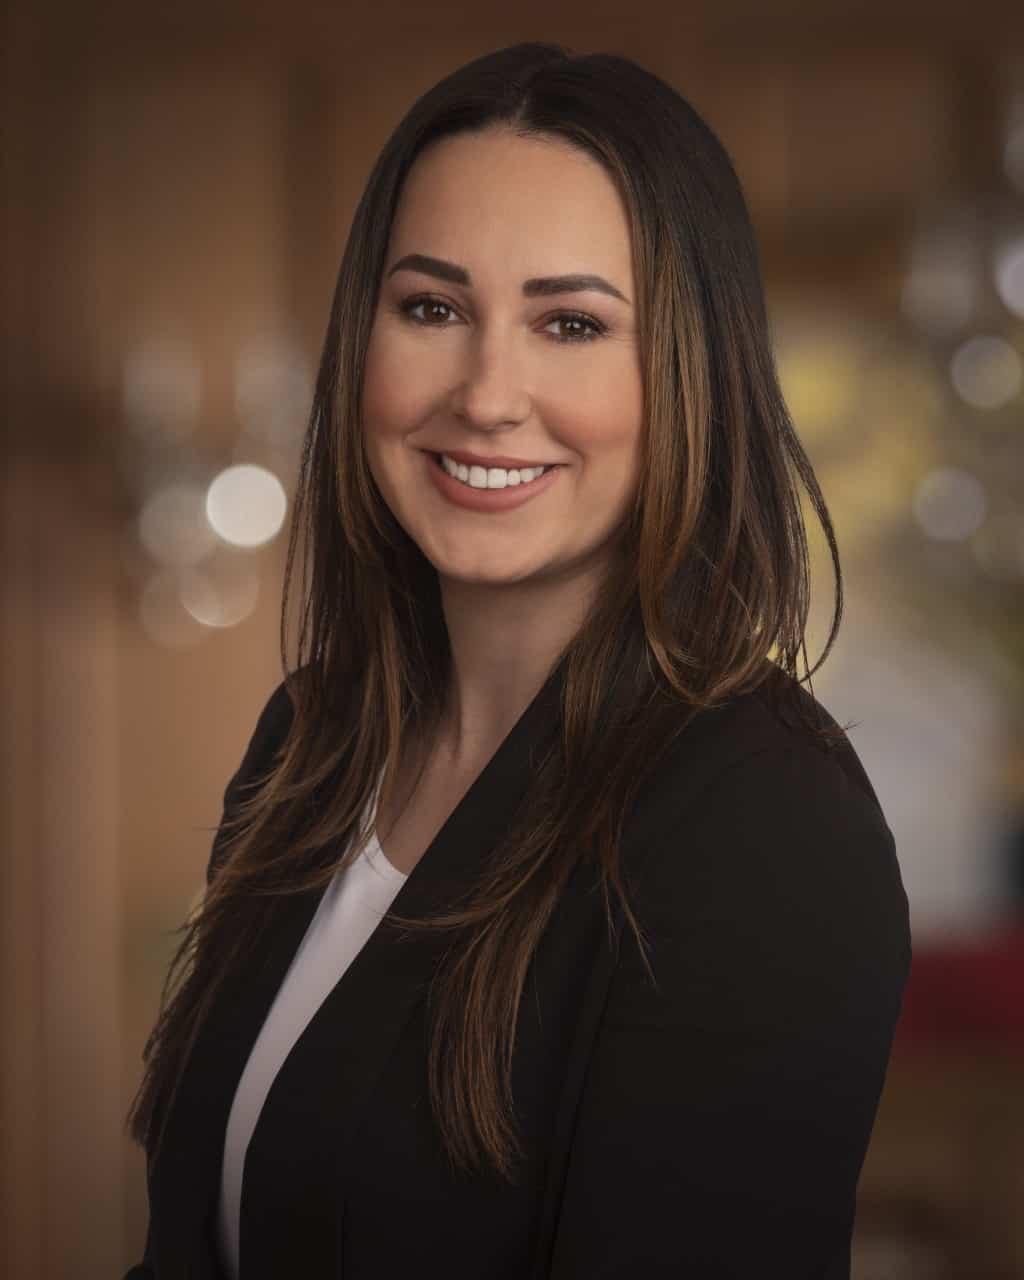 Michelle Foley